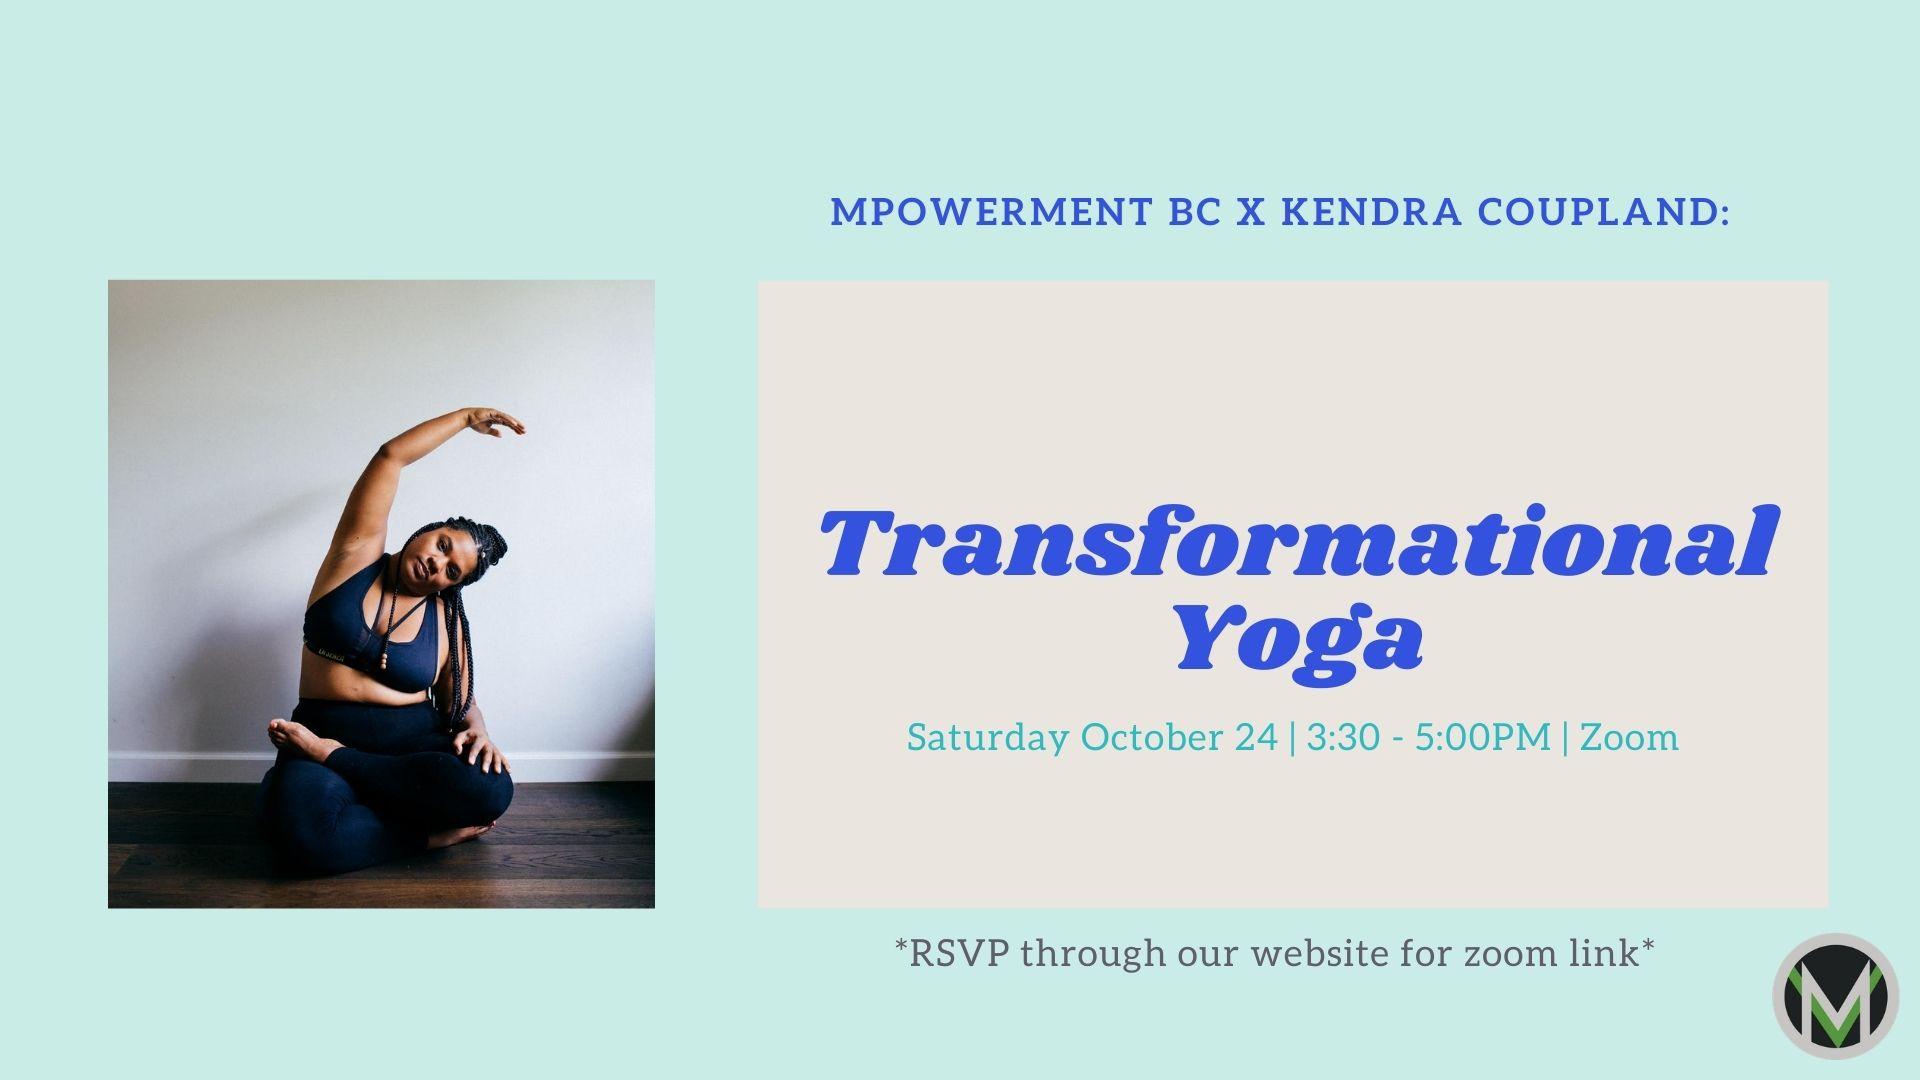 Mpowerment BC x Kendra Coupland